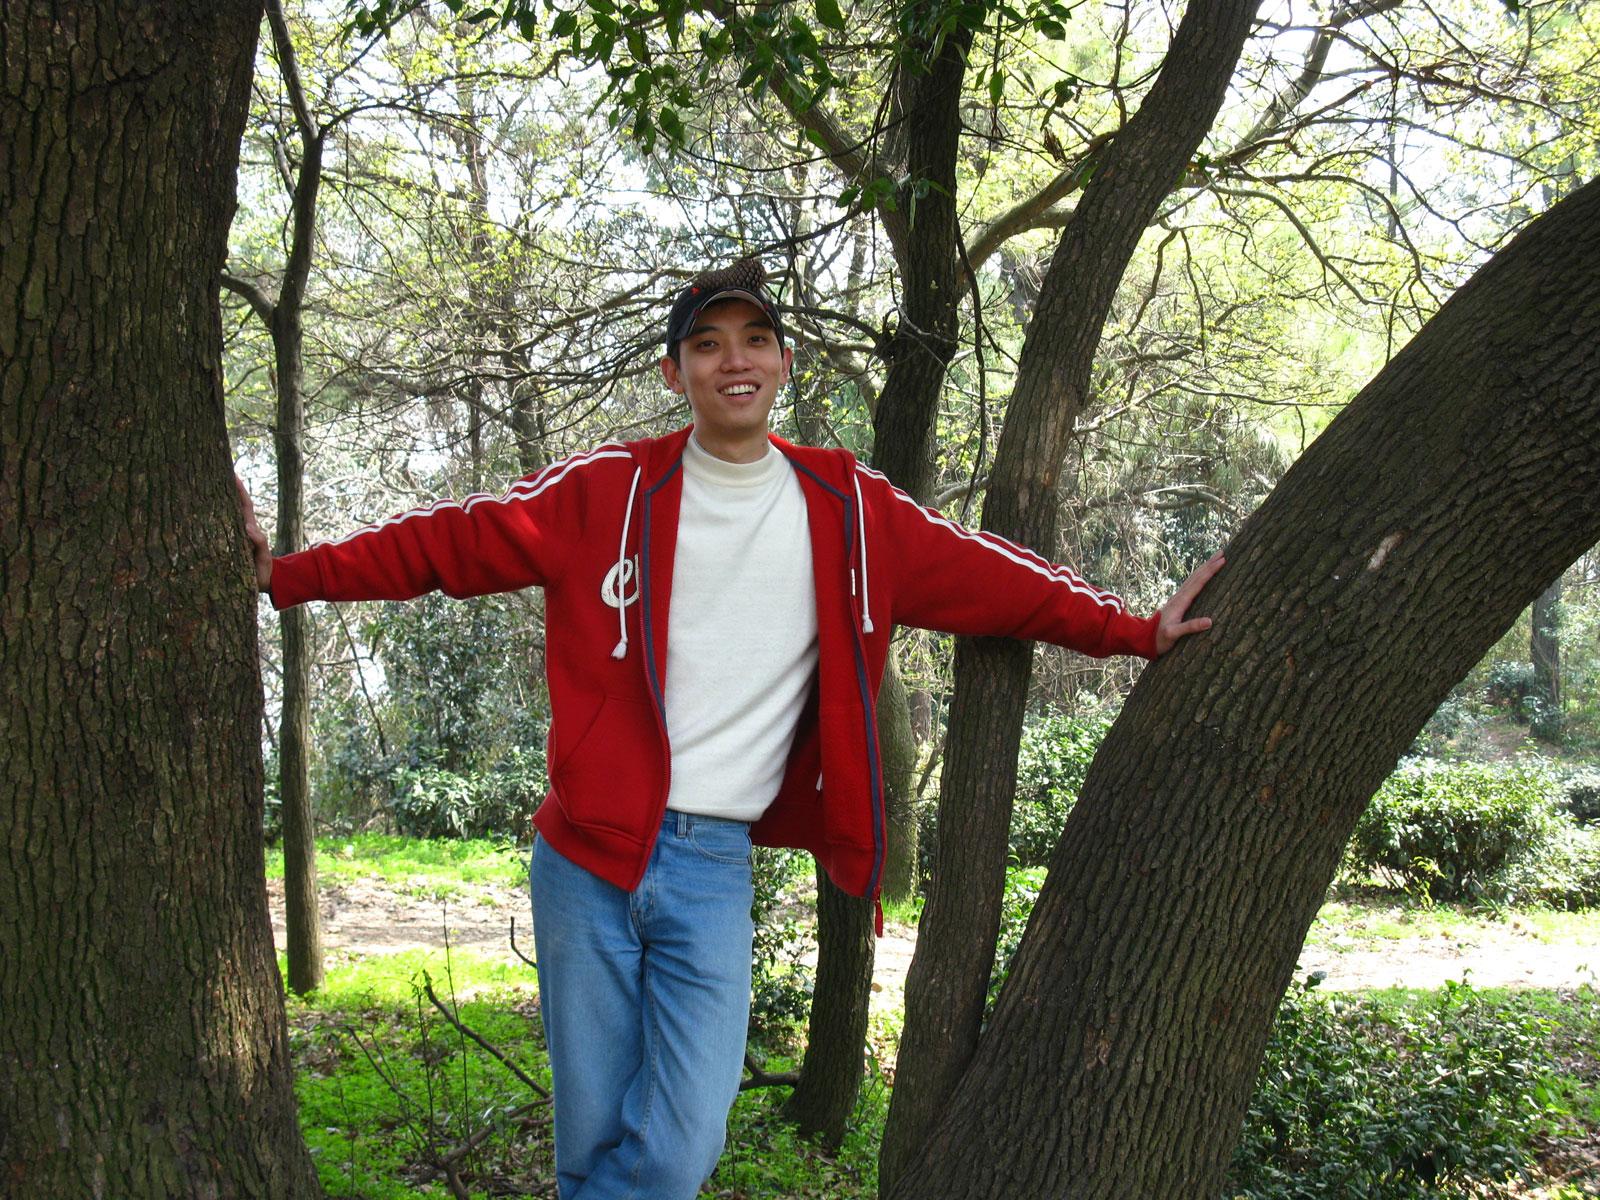 Outdoorioutdoorimg Tag: Leegorous